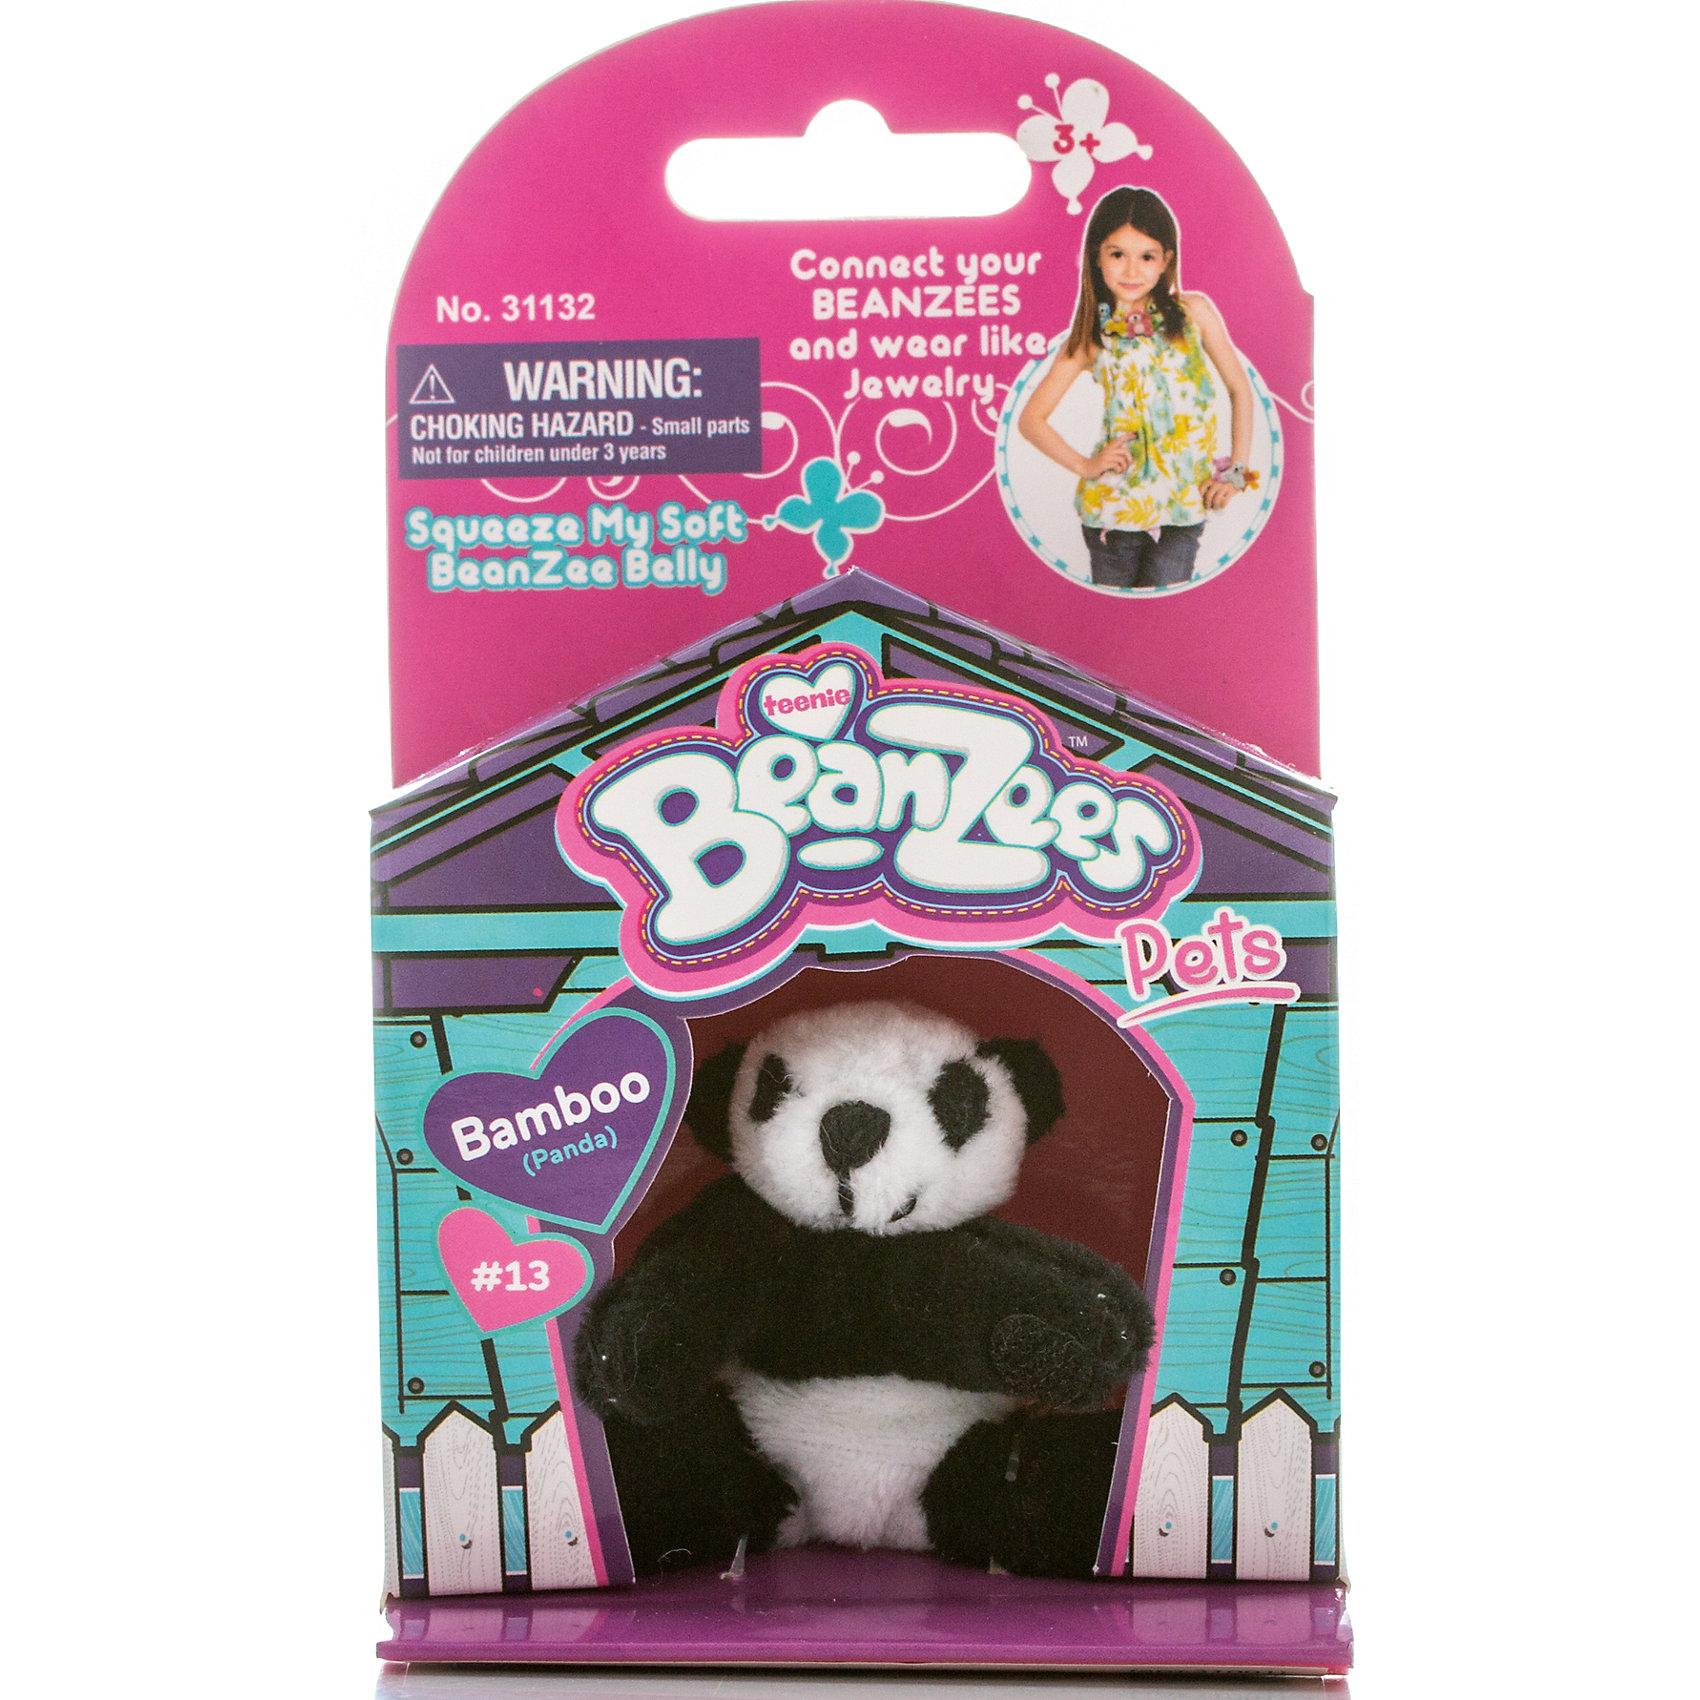 Beanzeez Мини-плюш Панда, Beanzeez 4moms электронное mamaroo 3 0 серый плюш